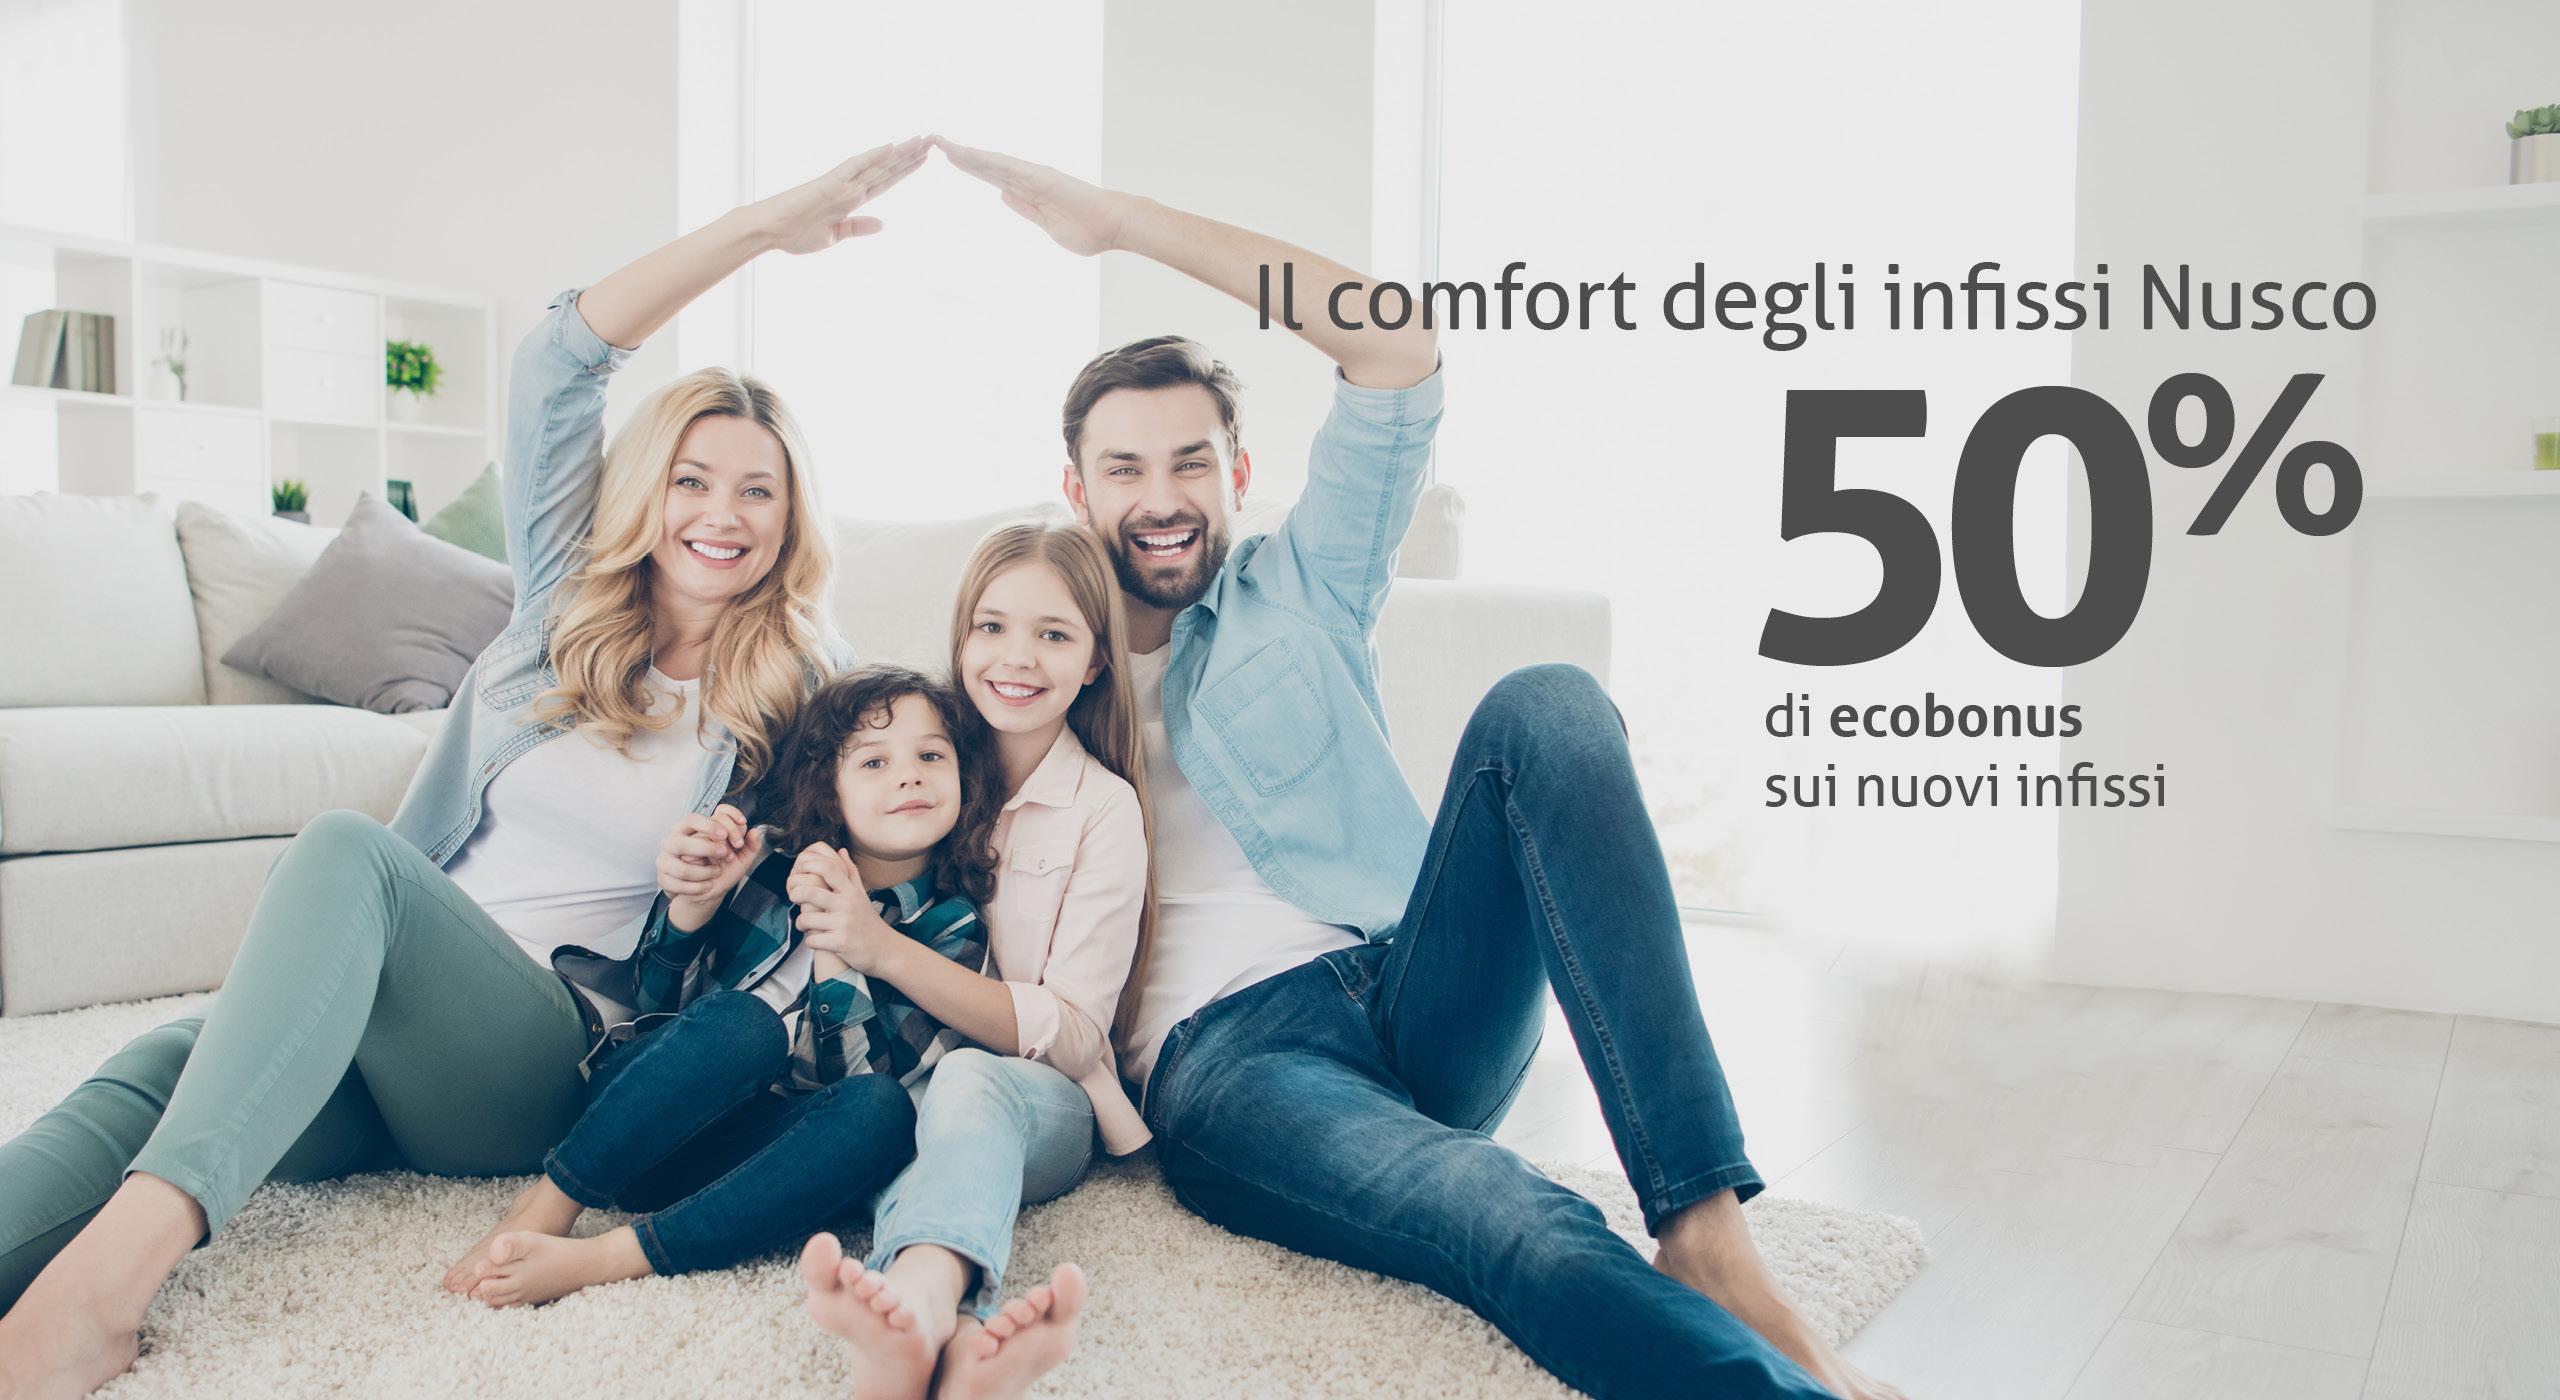 ECOBONUS 50%: INFISSI NUSCO A META' PREZZO